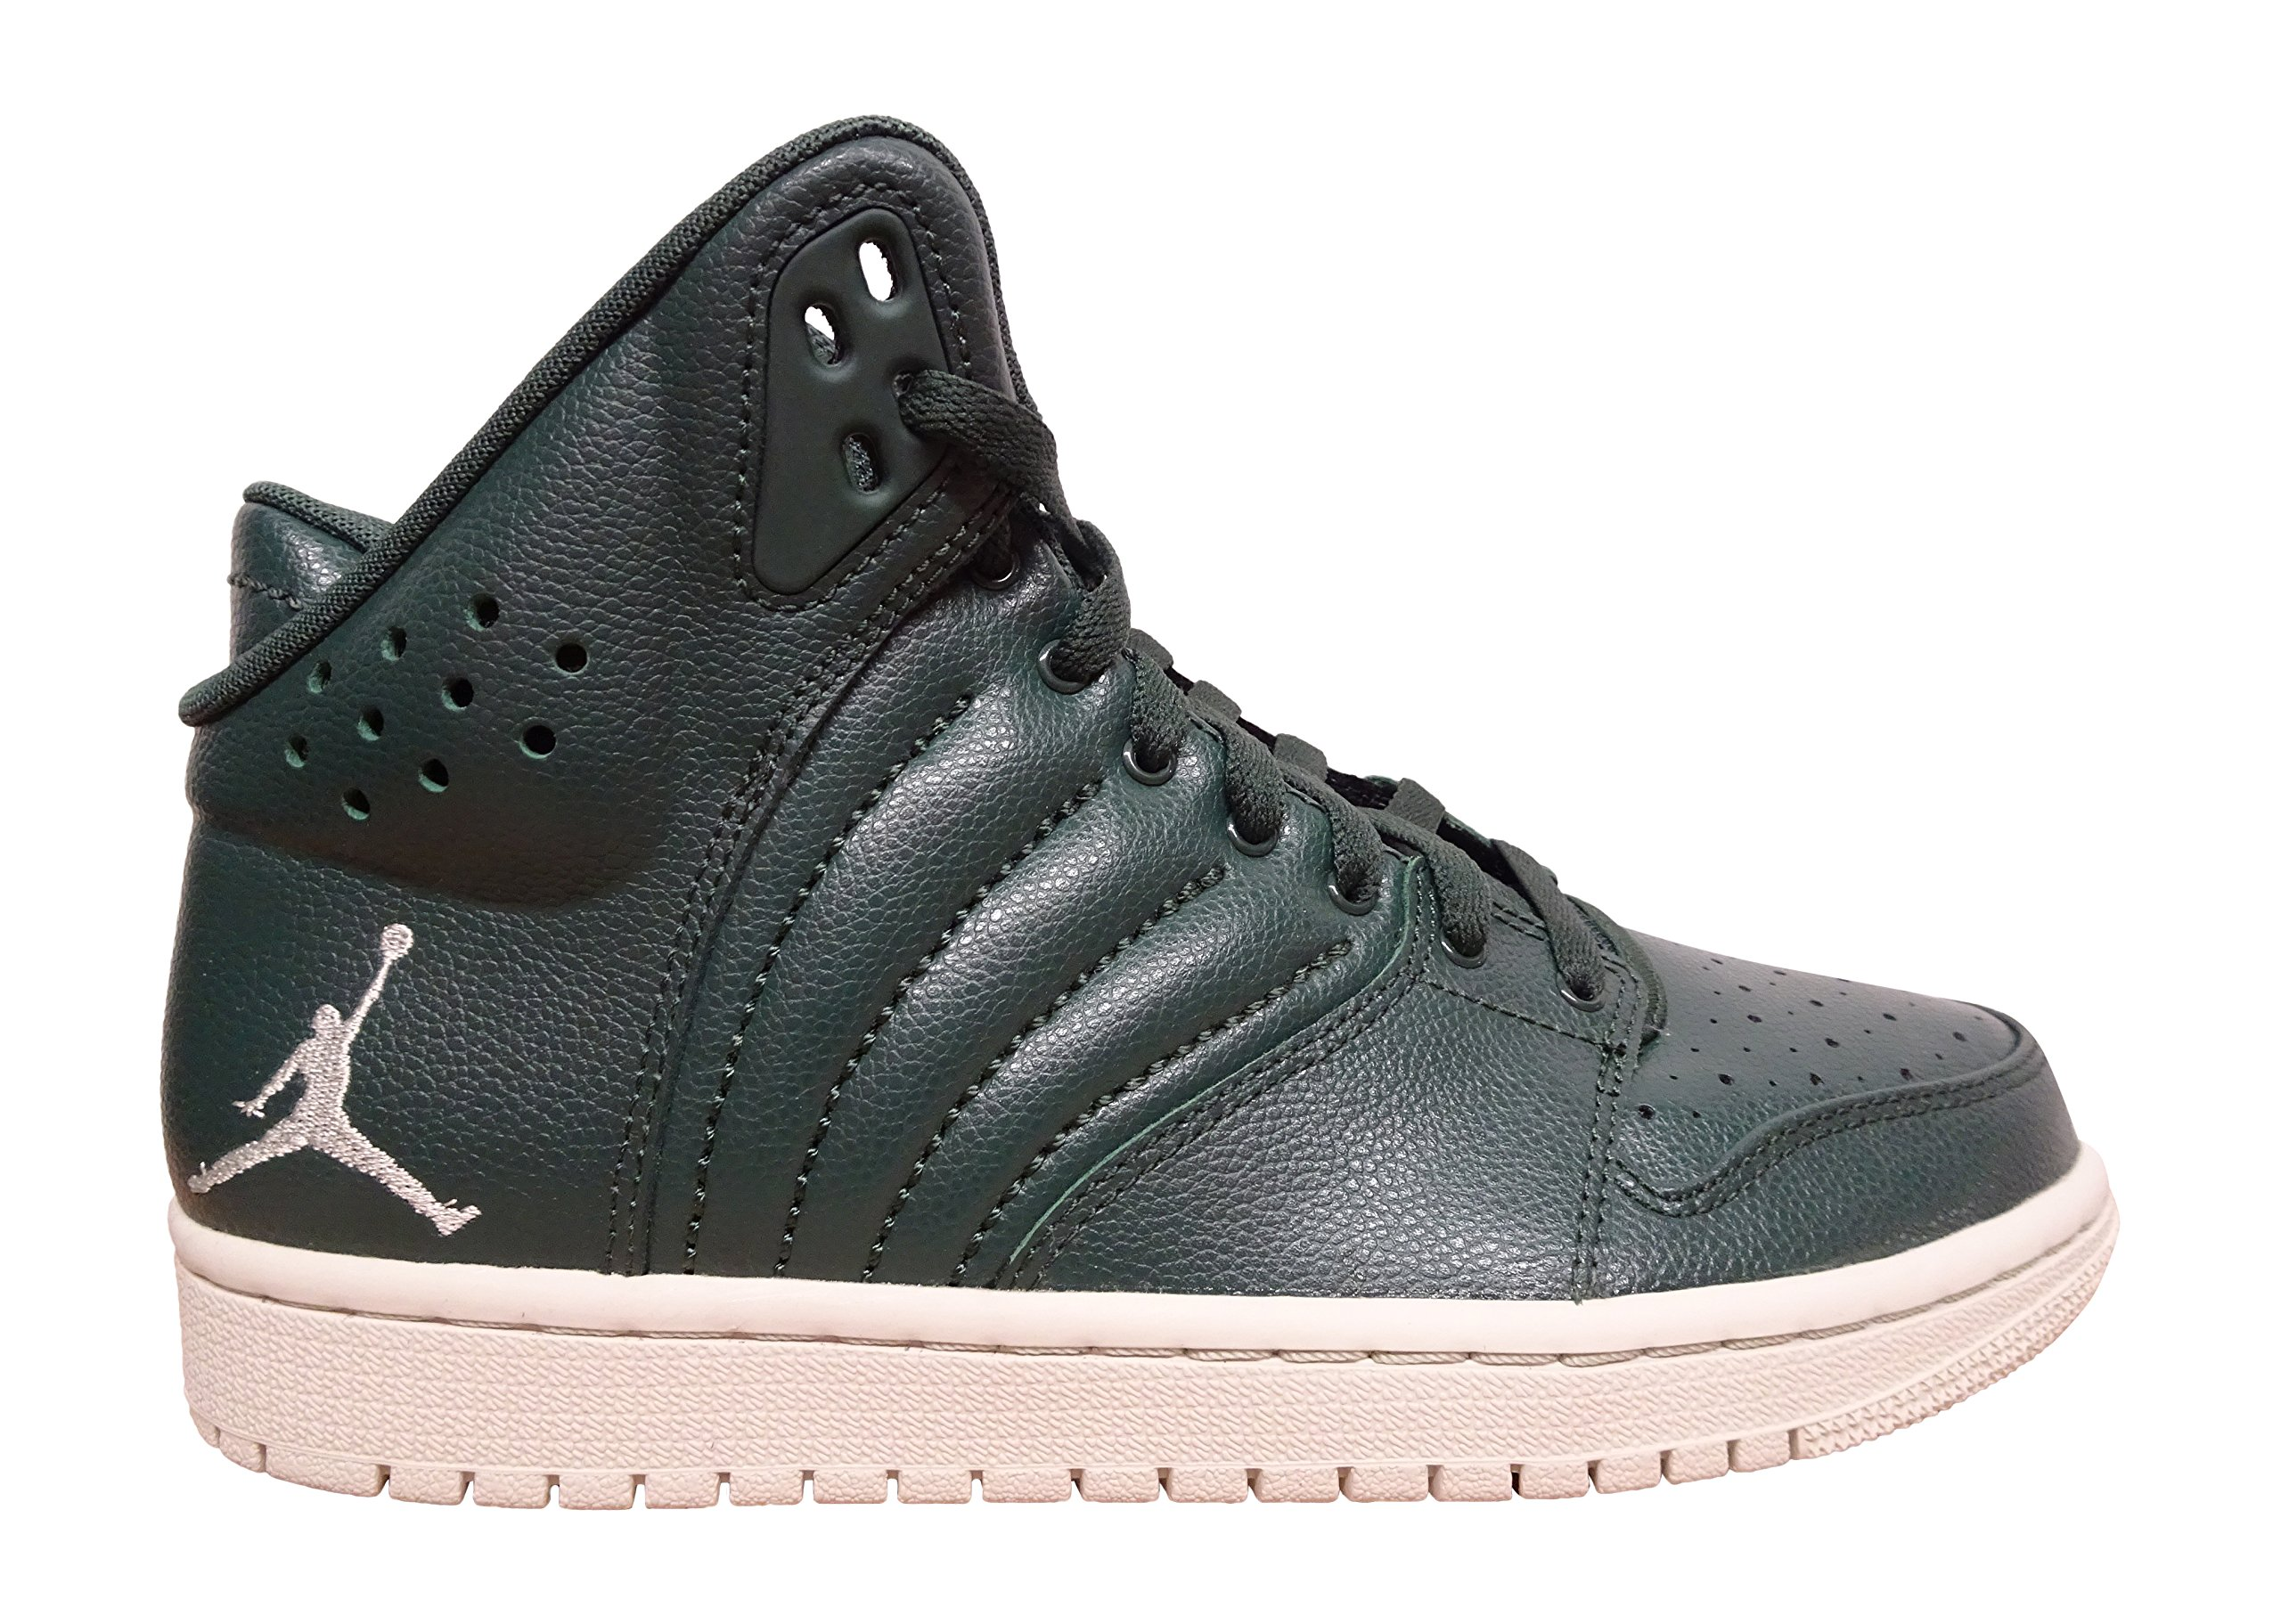 1f27e57c39f88a Galleon - NIKE Air Jordan 1 Flight 4 Mens Hi Top Basketball Trainers 820135  Sneakers Shoes (US 7.5